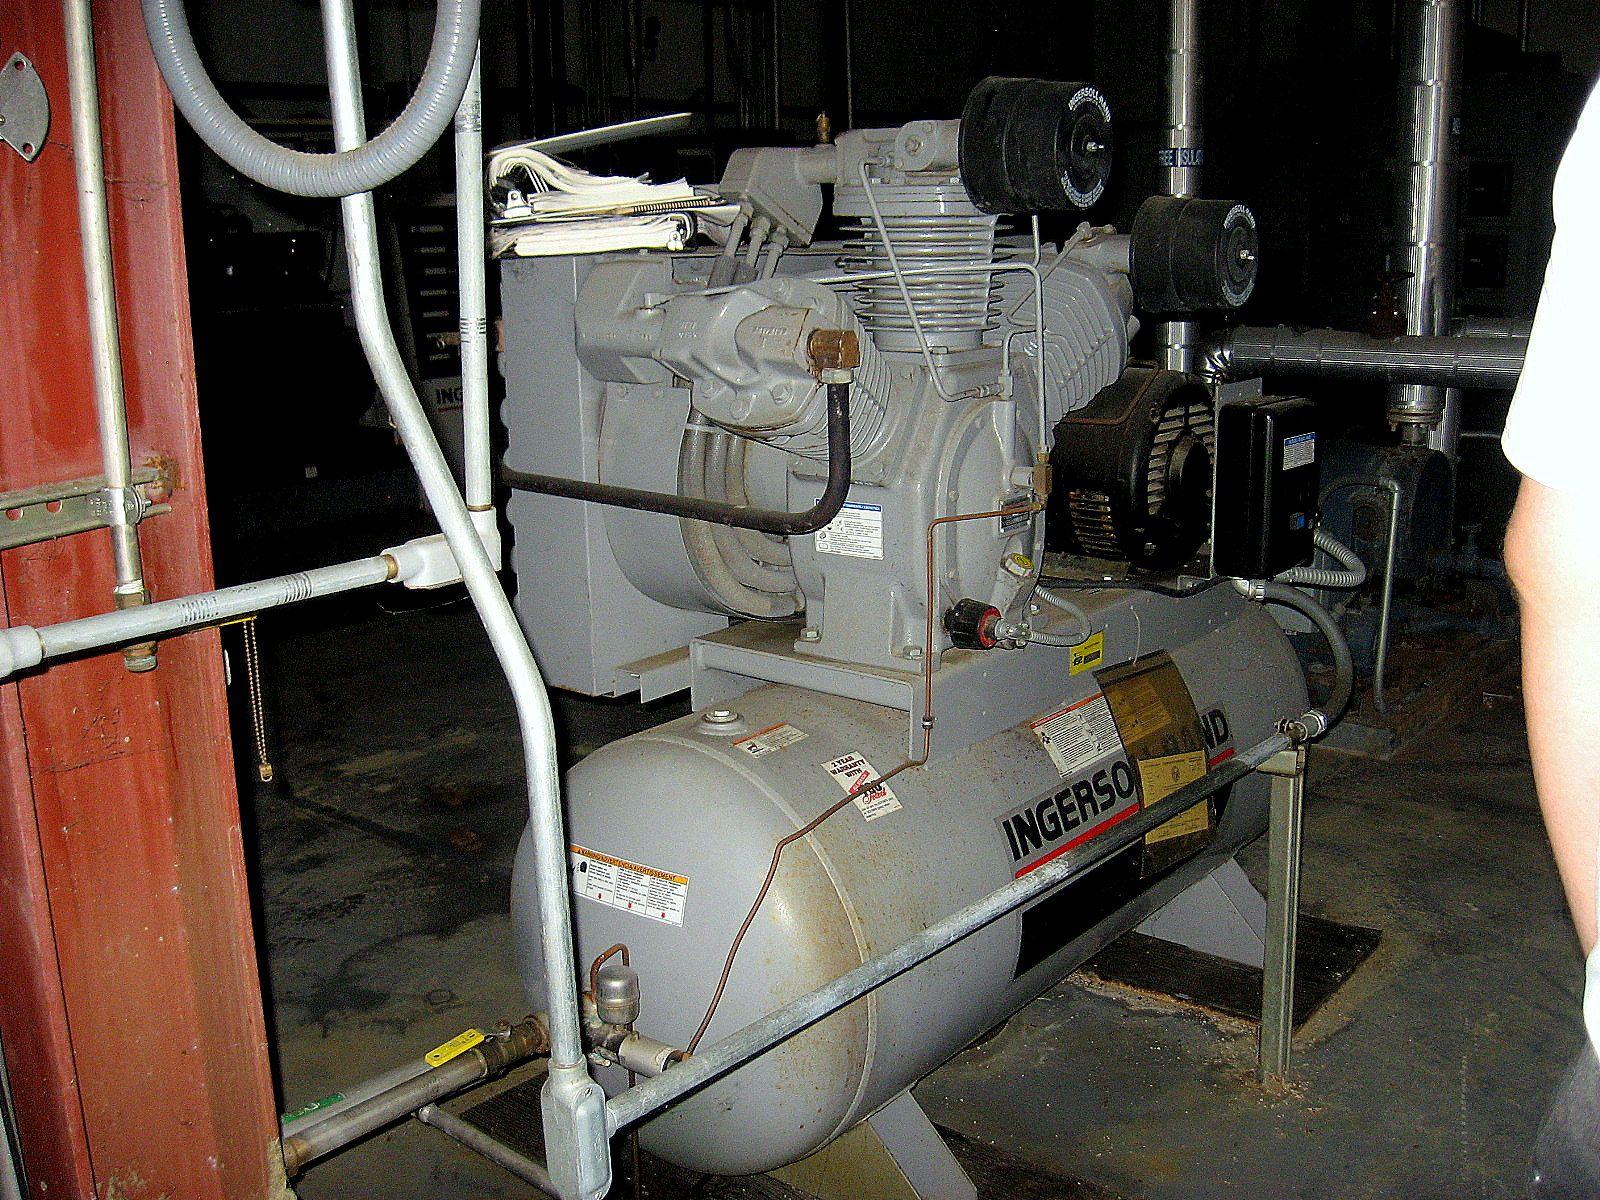 AIR COMPRESSOR - INGERSOLL RAND 3000 E25 - 25 HP - 175 PSI